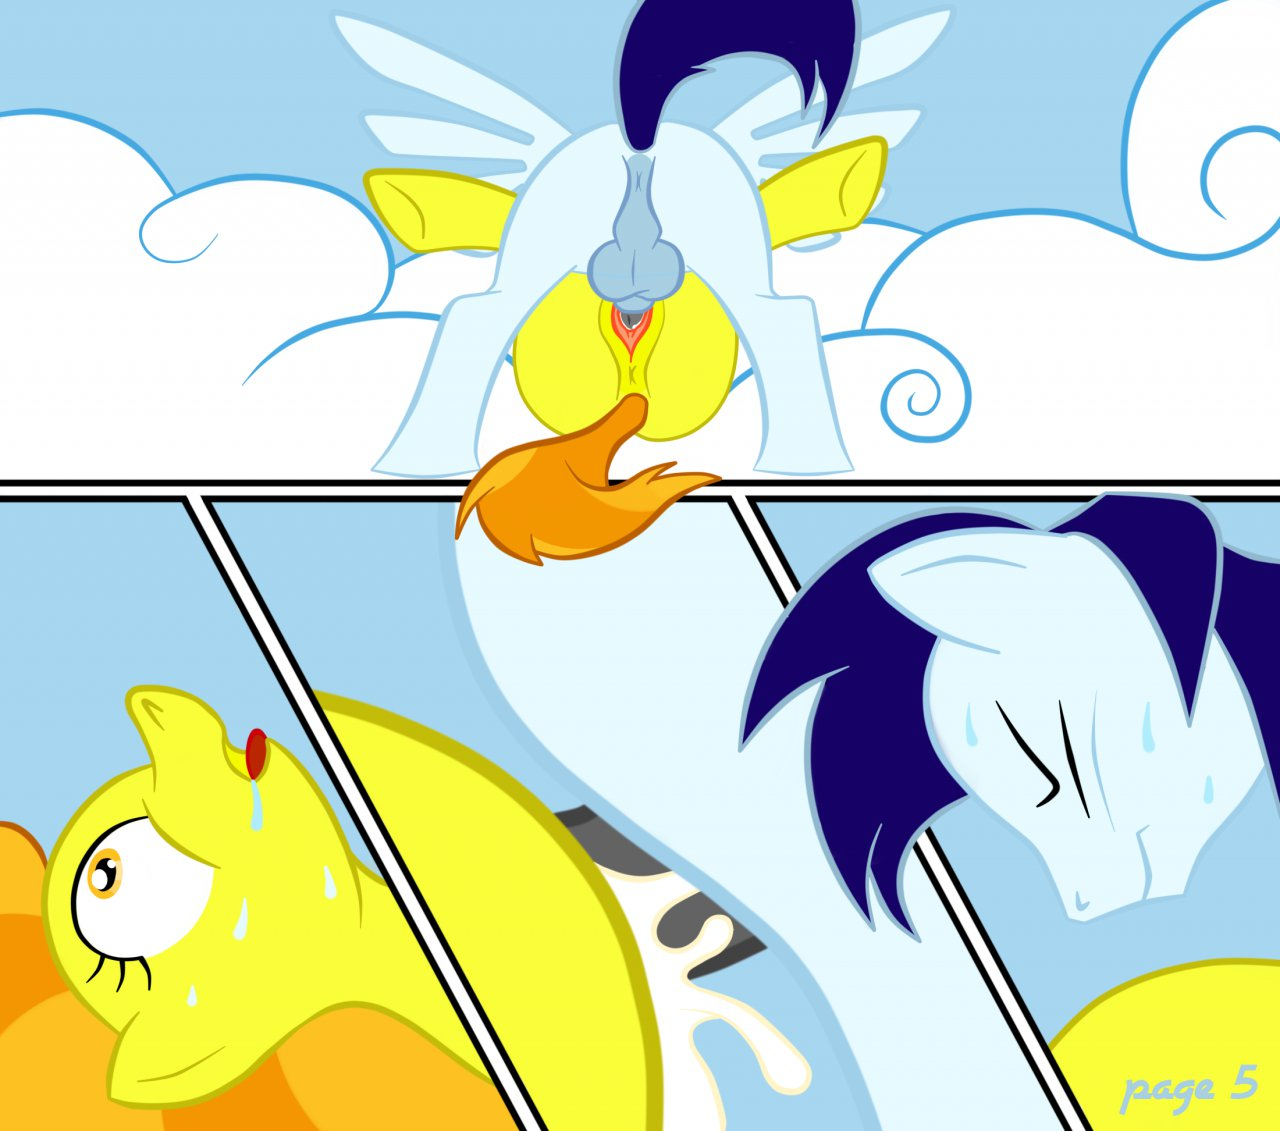 little comics pony my Fate apocrypha astolfo x sieg